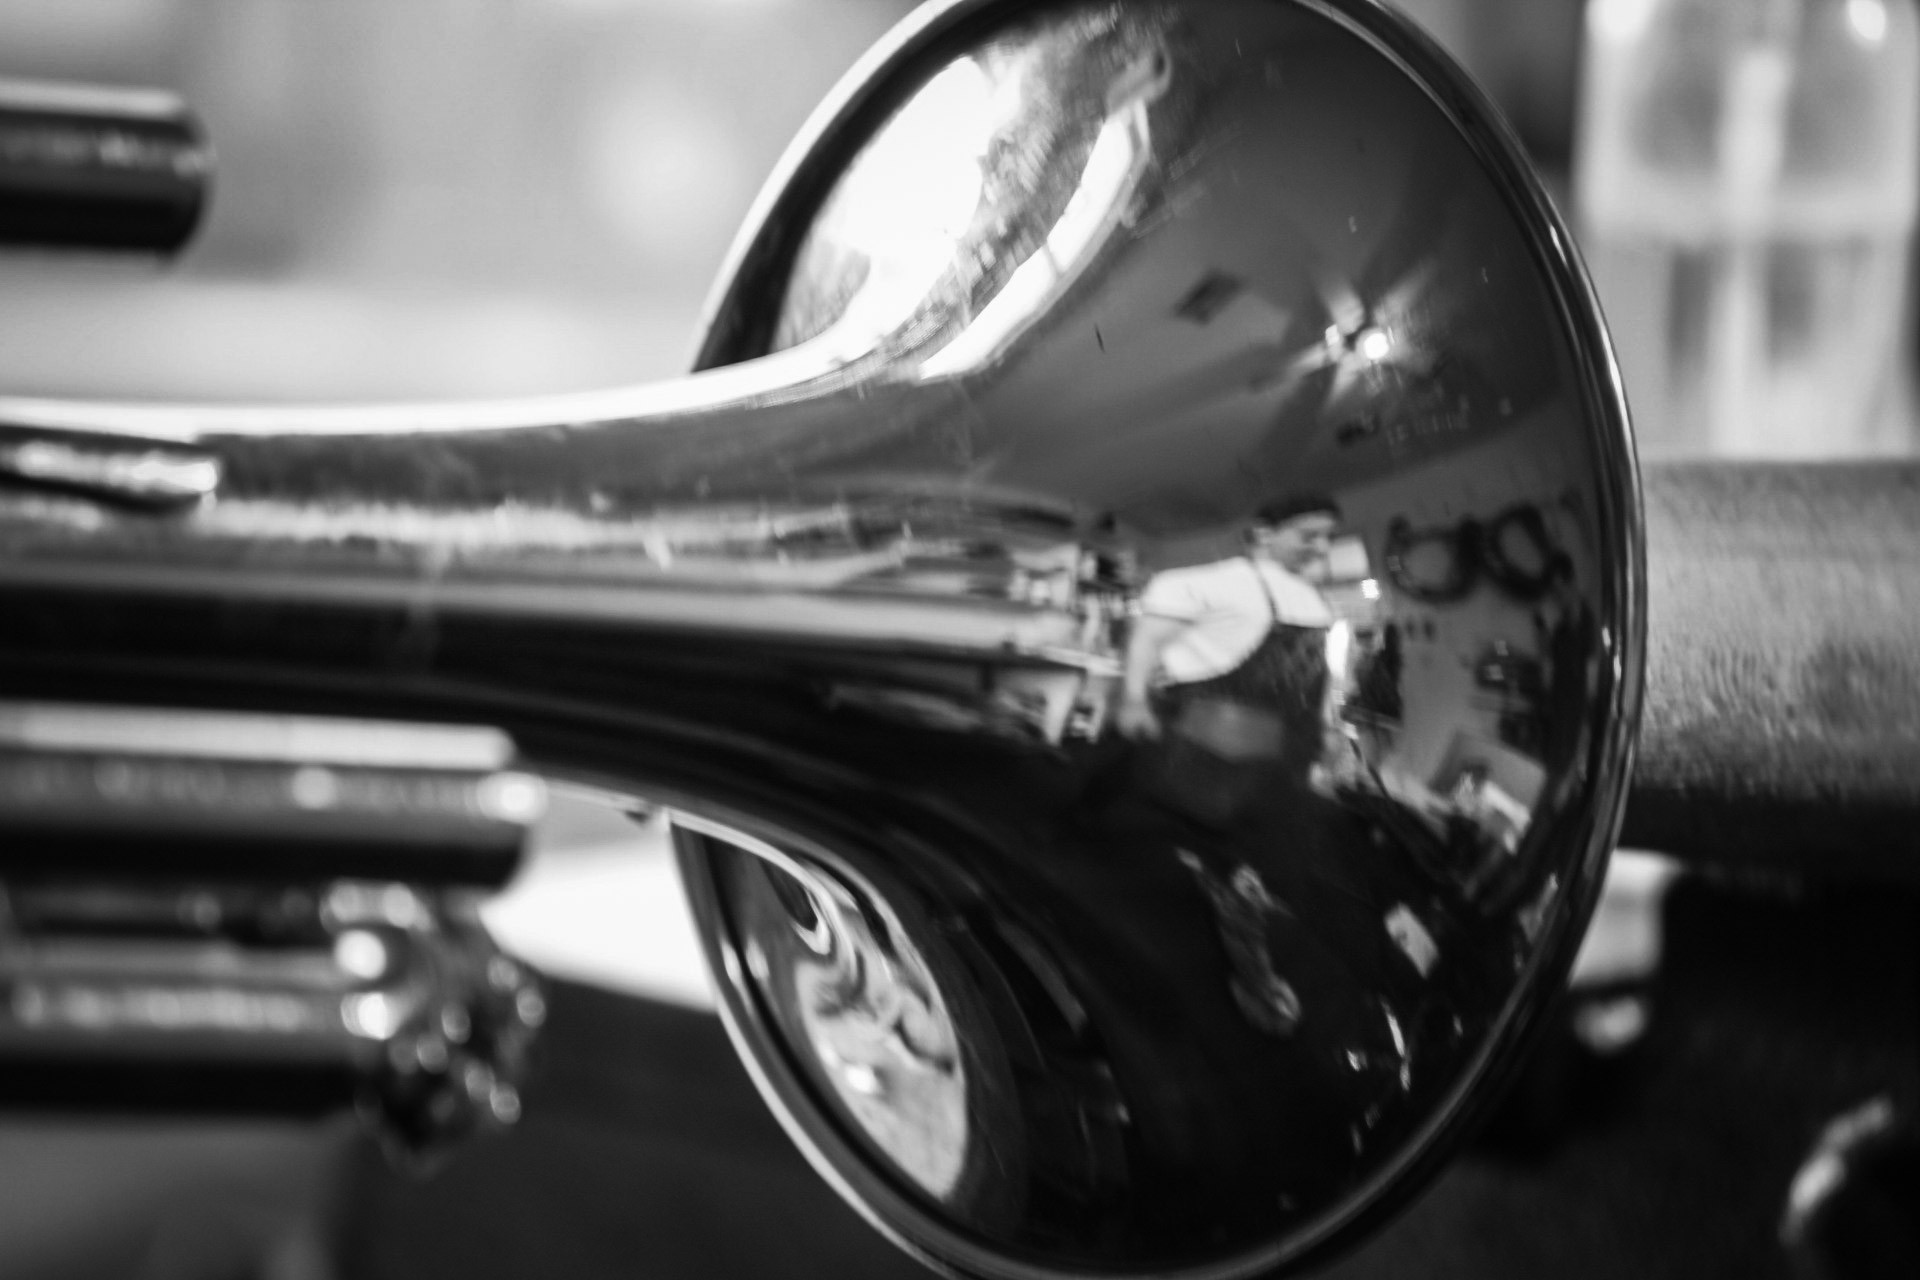 Band Instrument Repair/Service